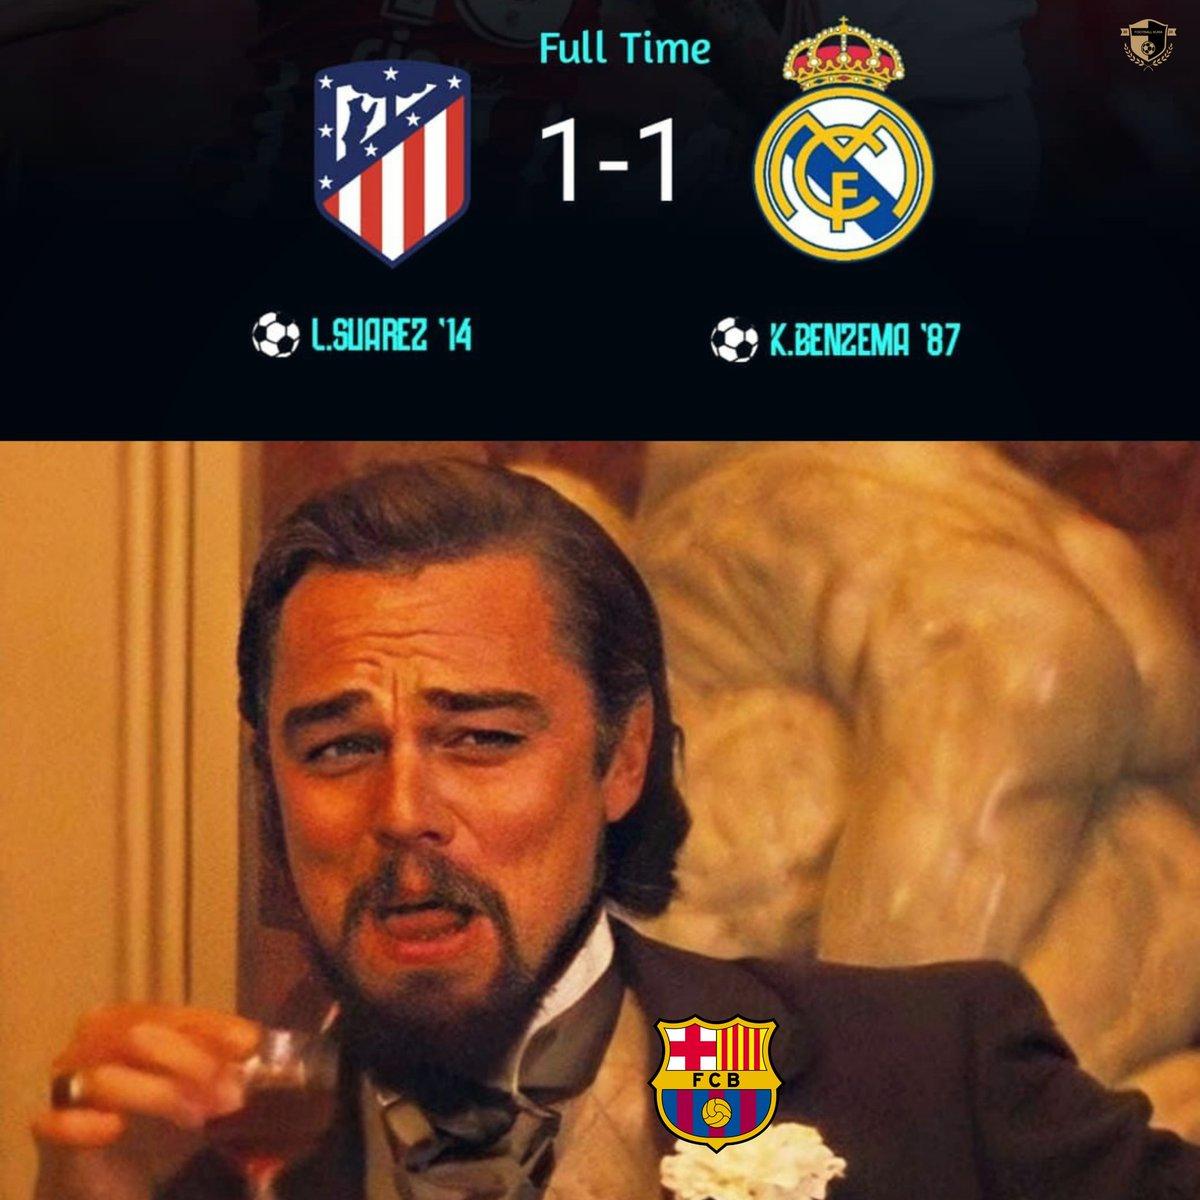 The real winner: FC Barcelona 😂😎  #laliga #Madridderby #Benzema #luissuarez  #premierleauge #manchesterderby #manchesterunited #manchestercity #ggmu # #AtleticoMadrid #realmadrid #Bundesliga #bayernmünchen e